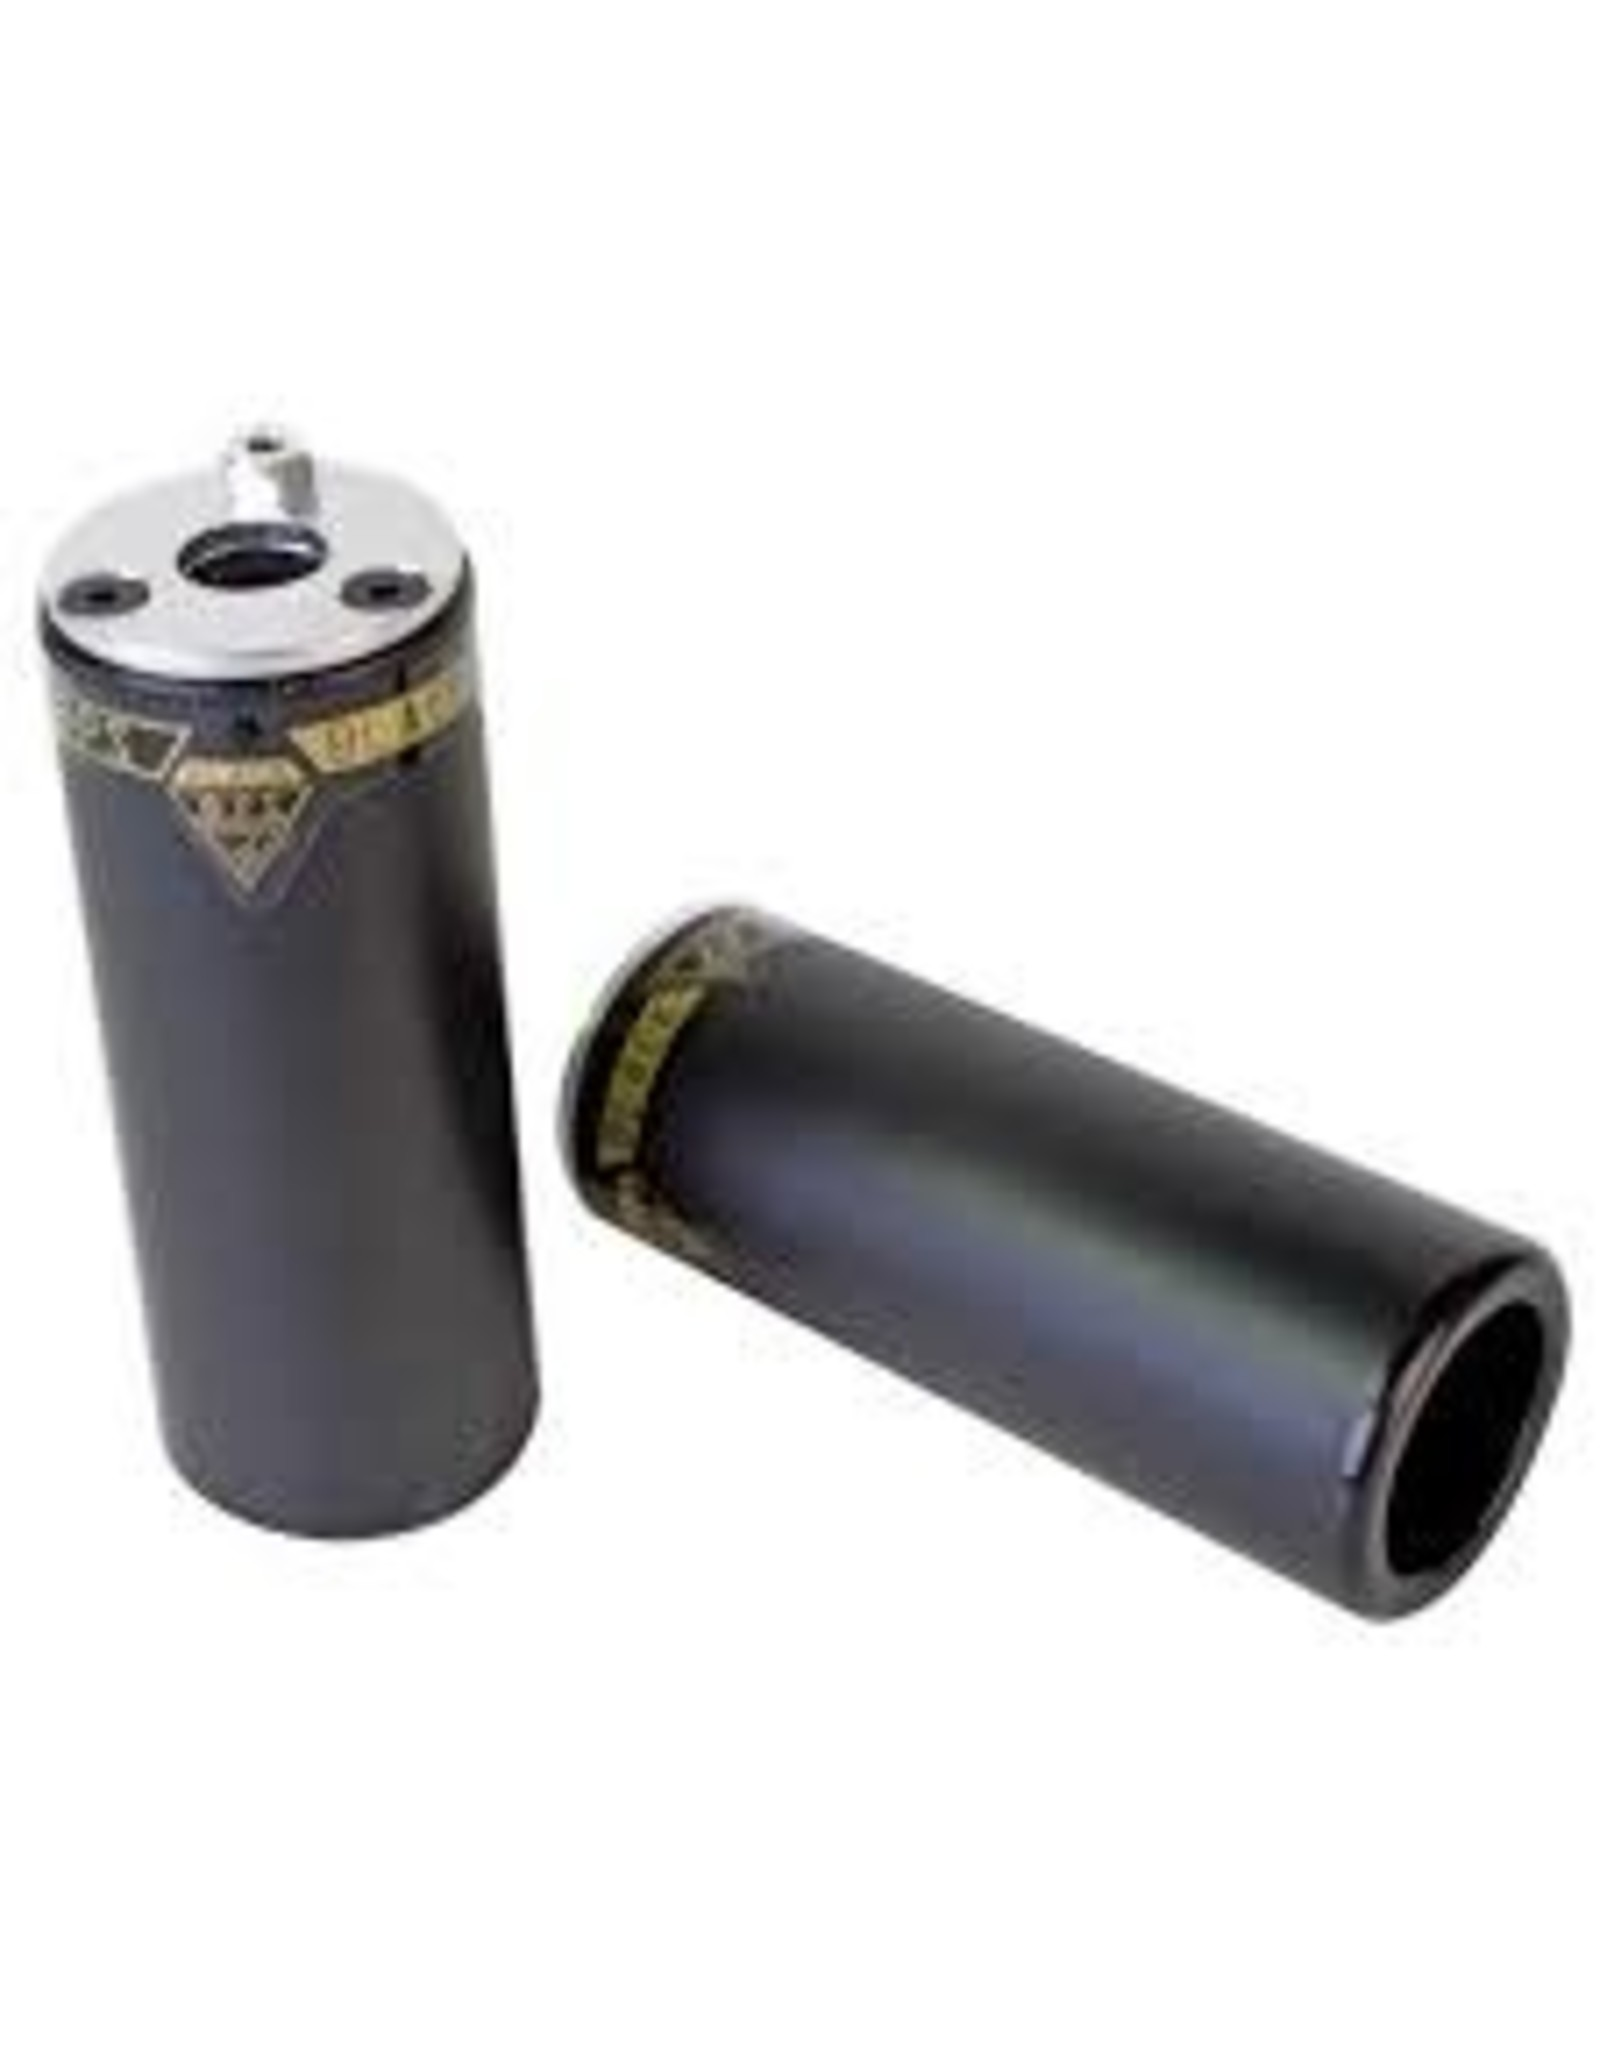 BLACK OPS Axle Pegs Bk-Ops DC BK 40x100 3/8-14mm